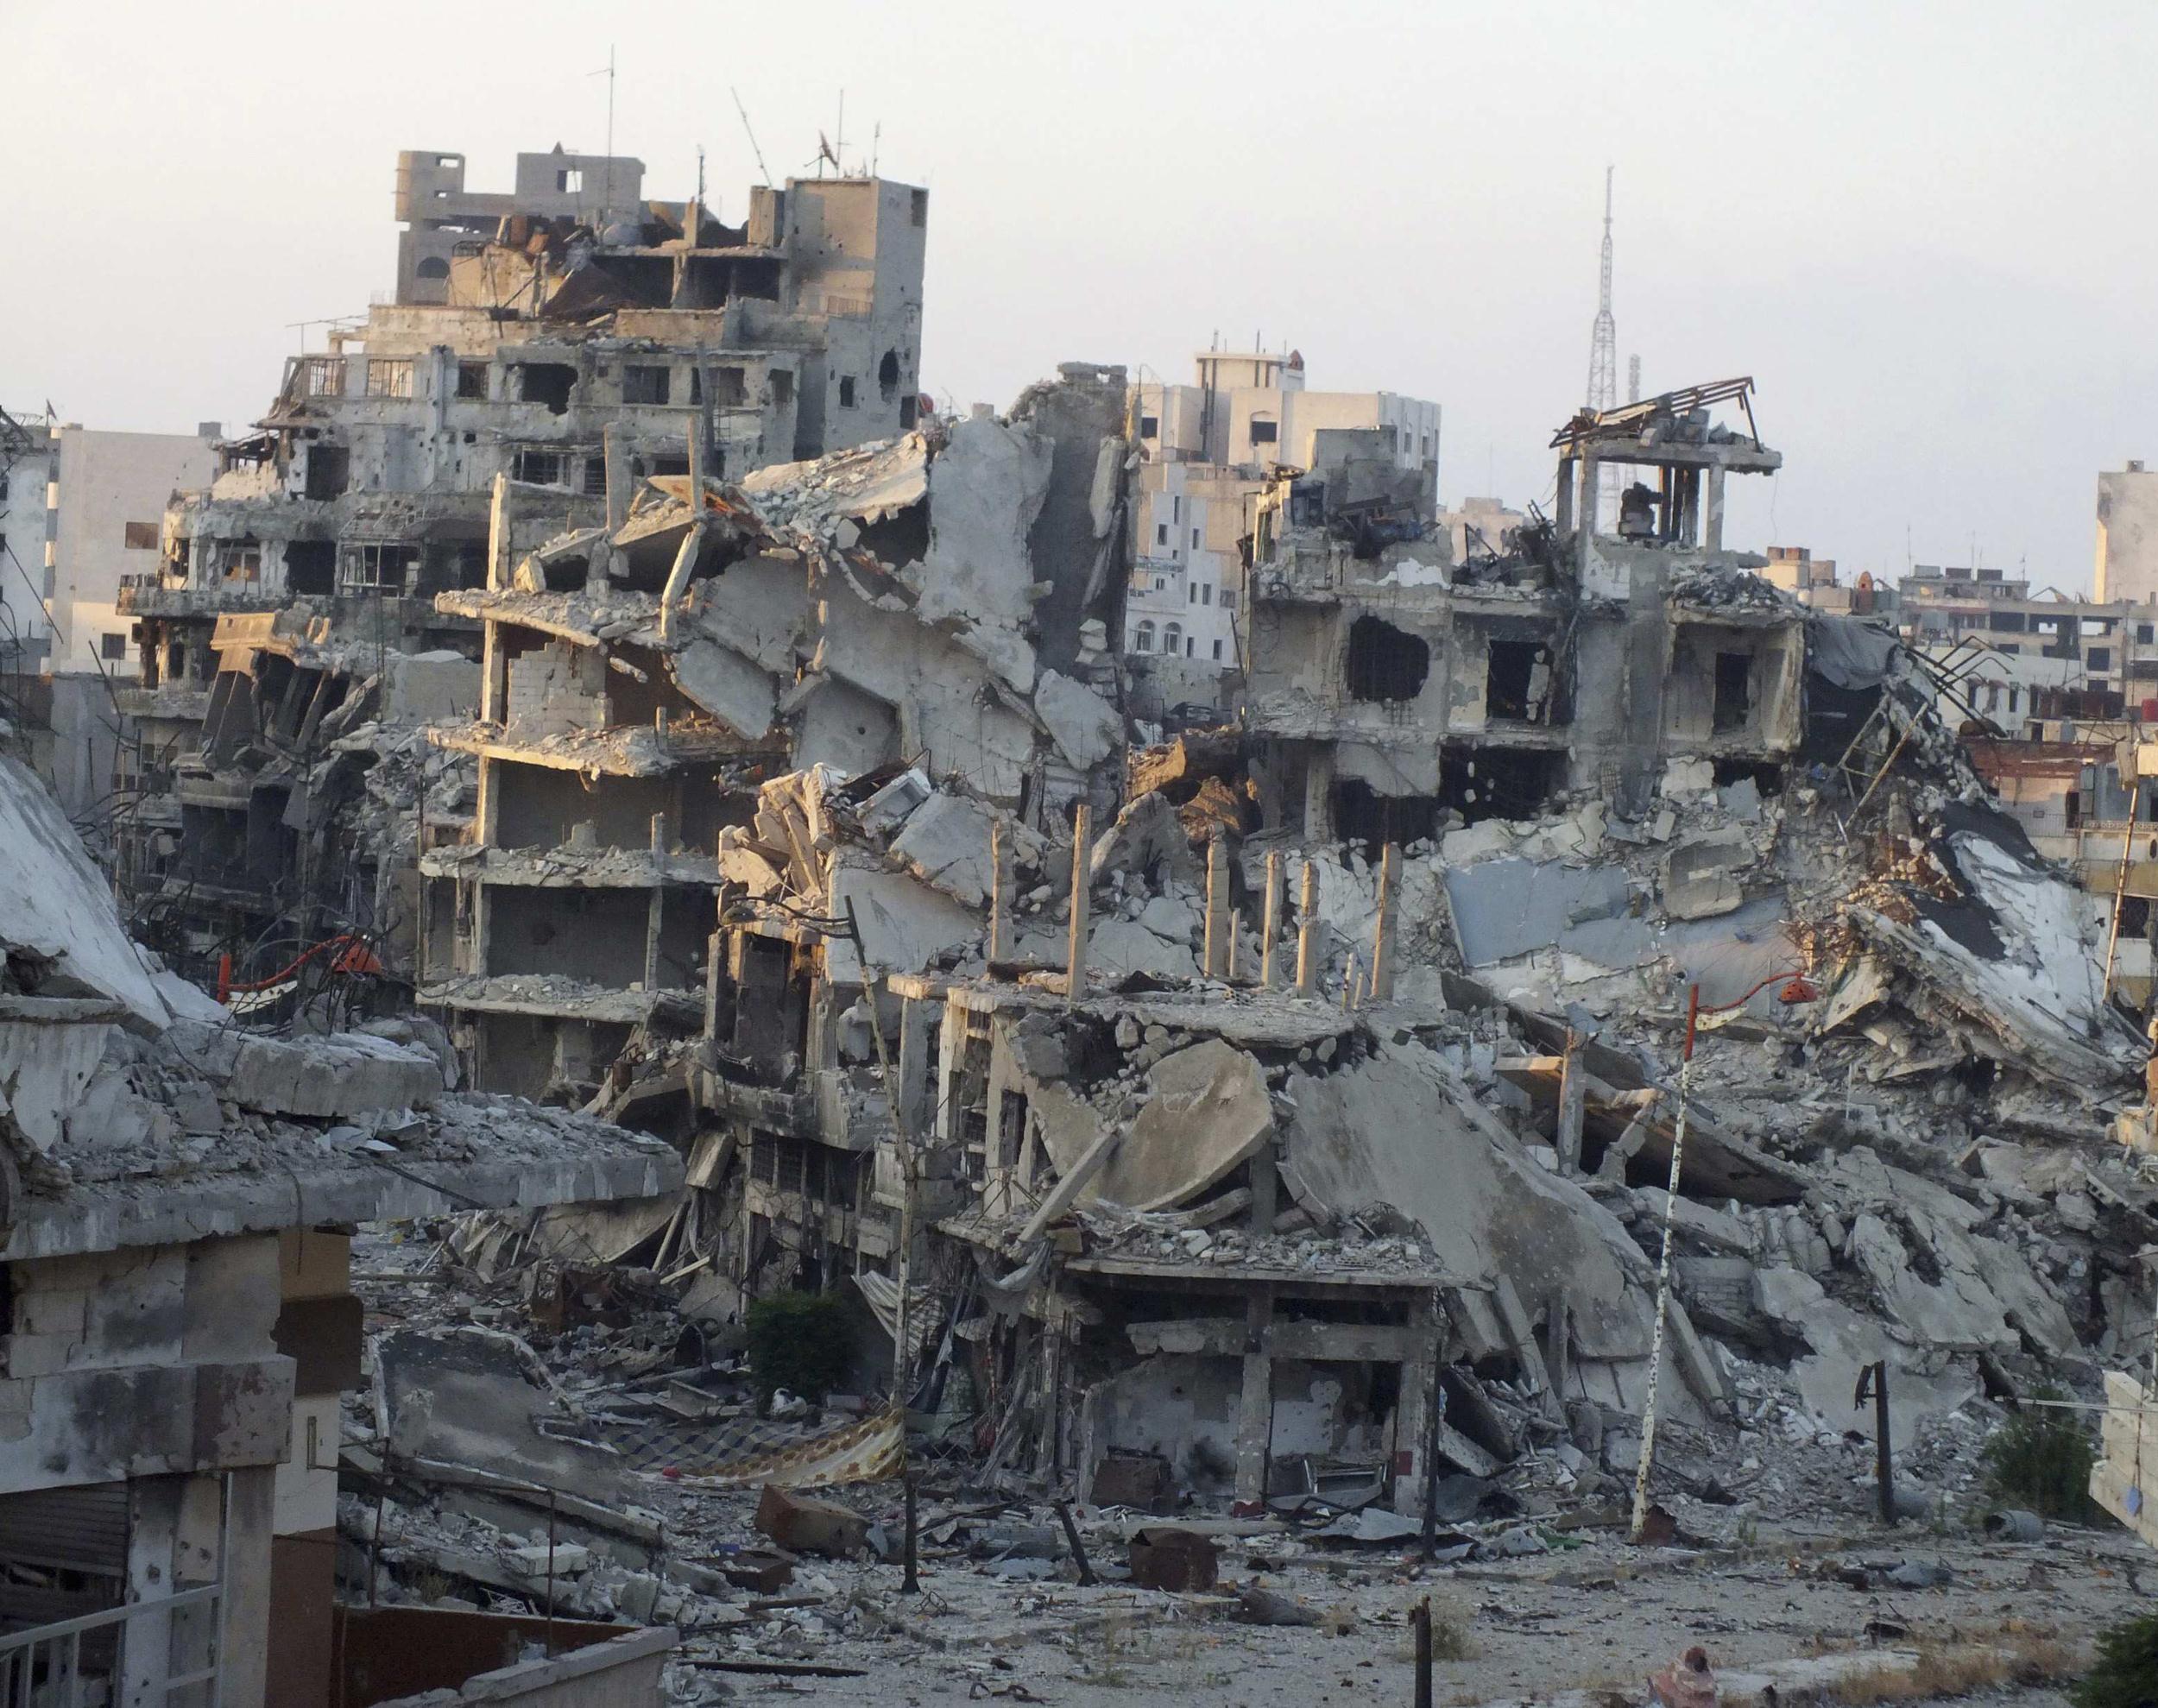 http://media2.s-nbcnews.com/i/newscms/2014_04/130866/cms-140122-syria-damage-6a_ac3483766edeeb24b1edc94ae32c8751.jpg